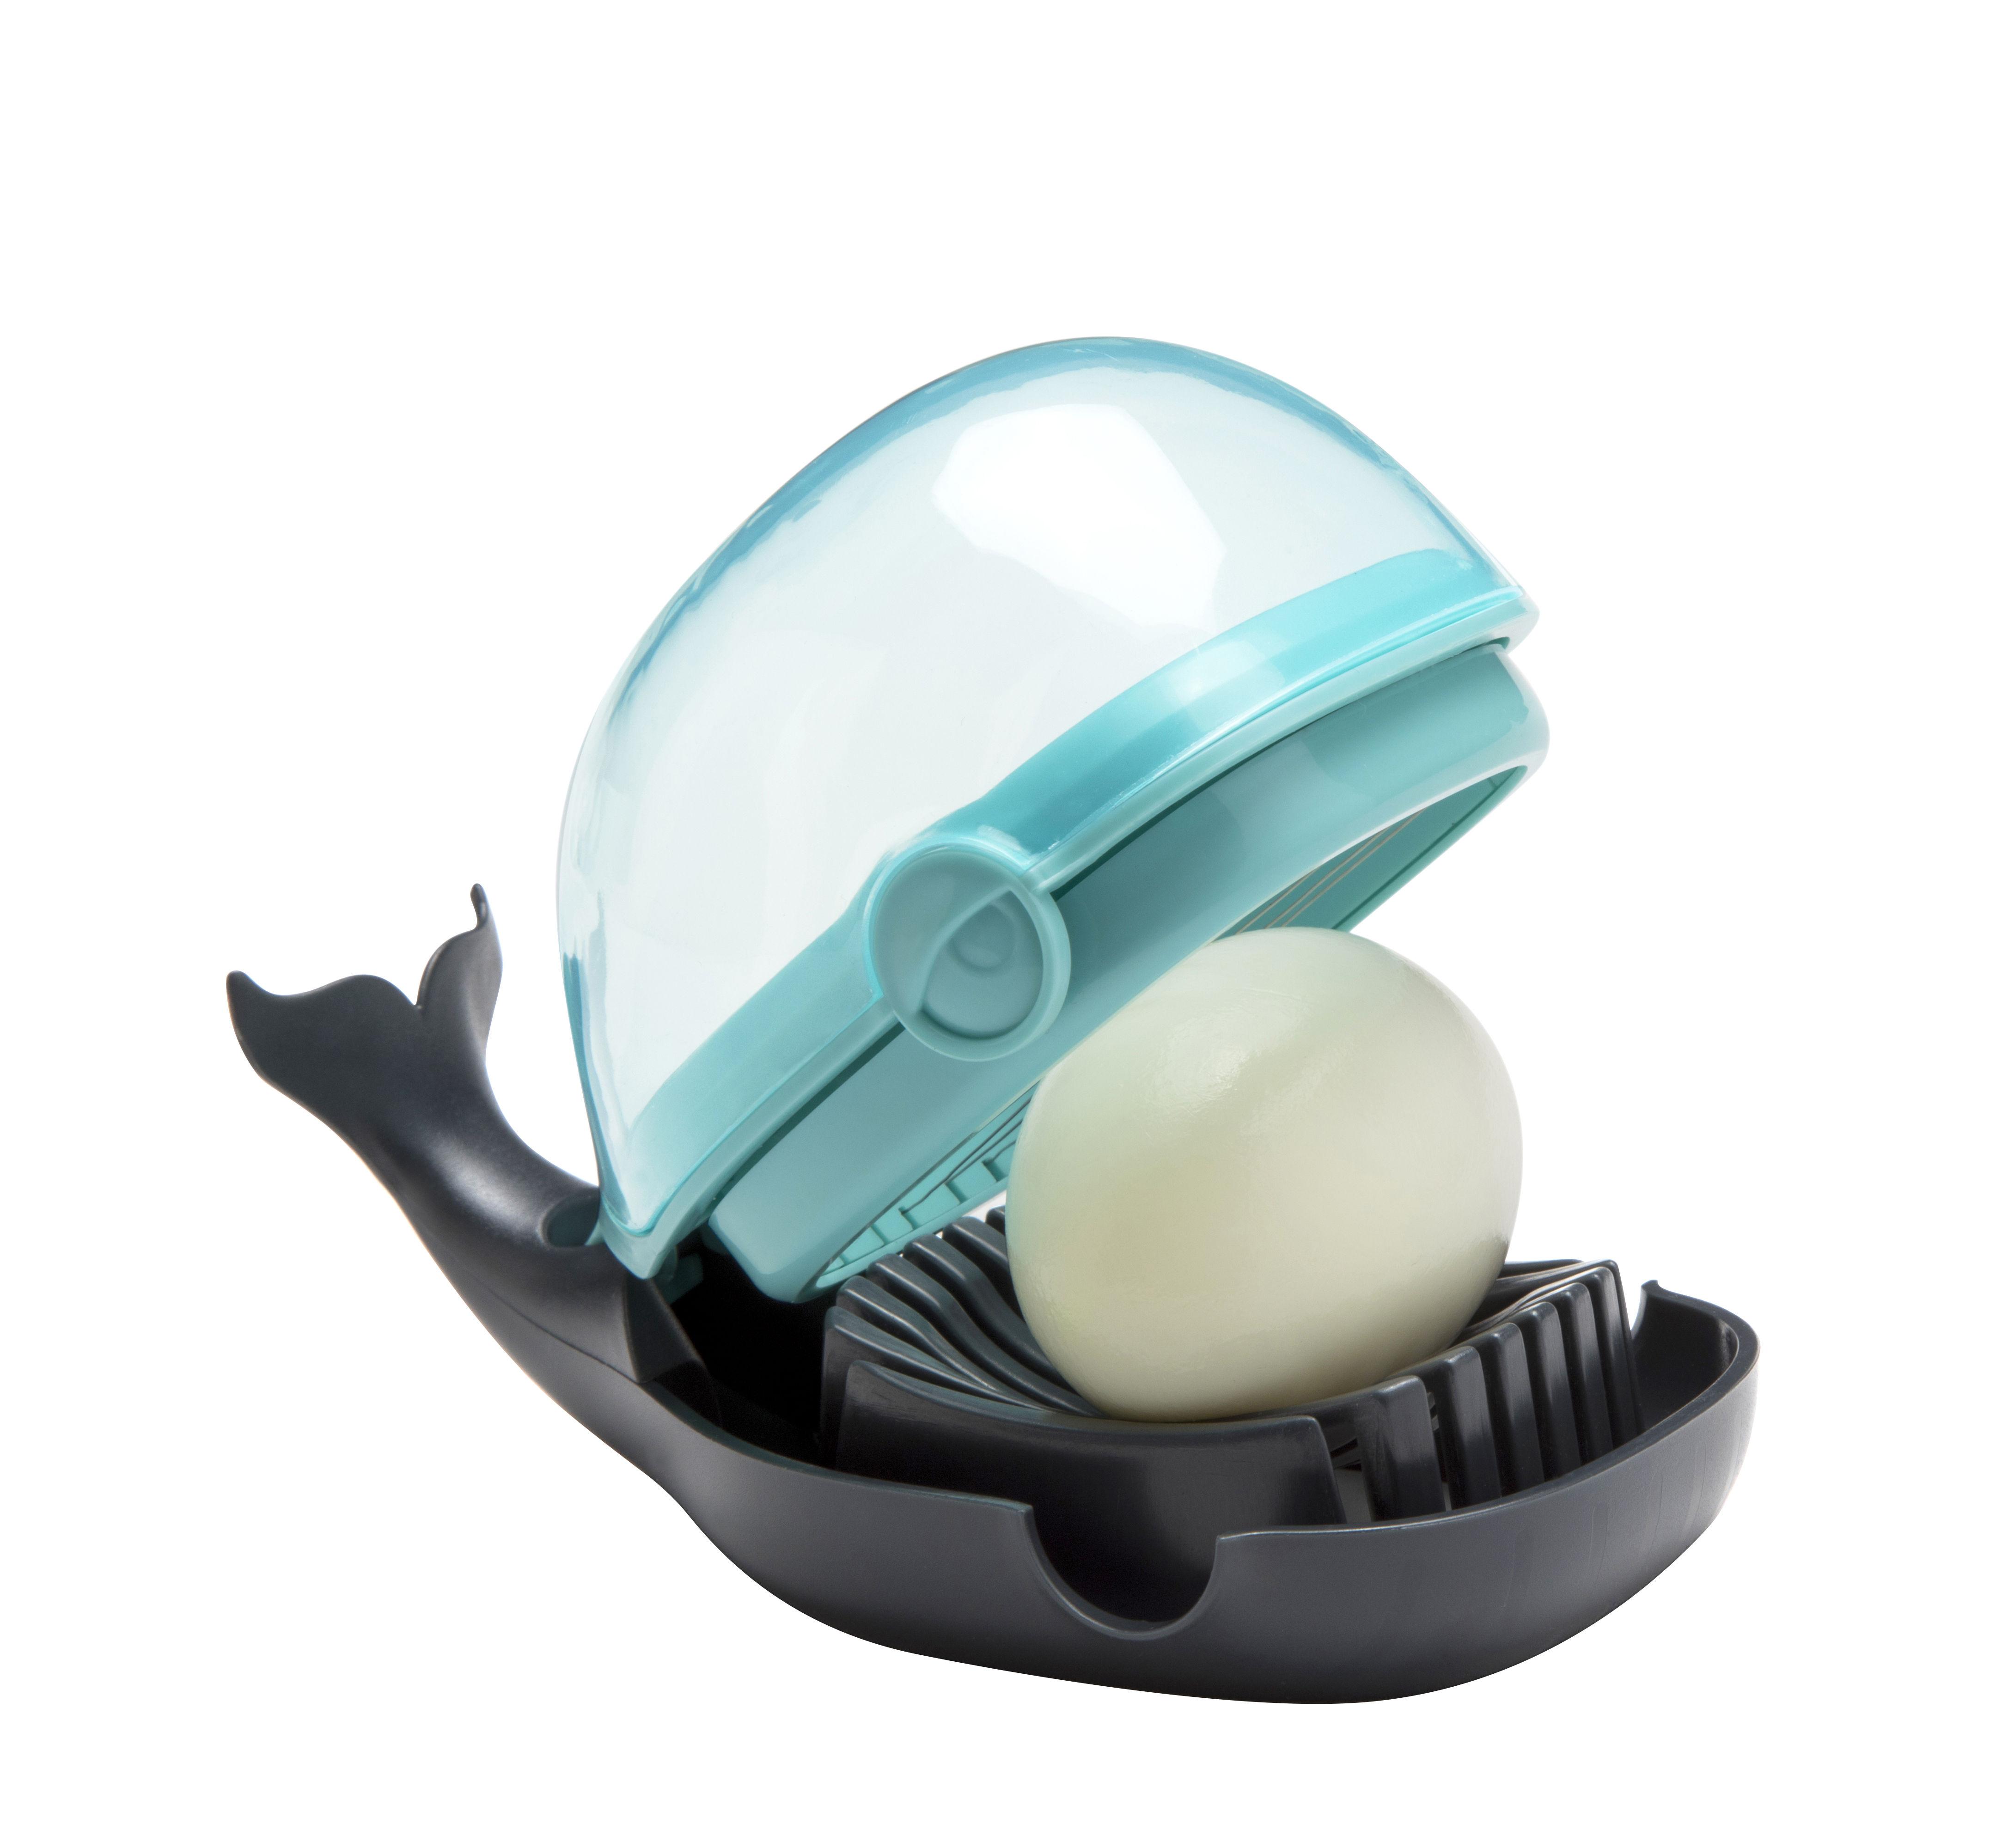 Cucina - Utensili da cucina - Taglia uovo Humphrey di Pa Design - Blu - ABS, Acciaio inossidabile